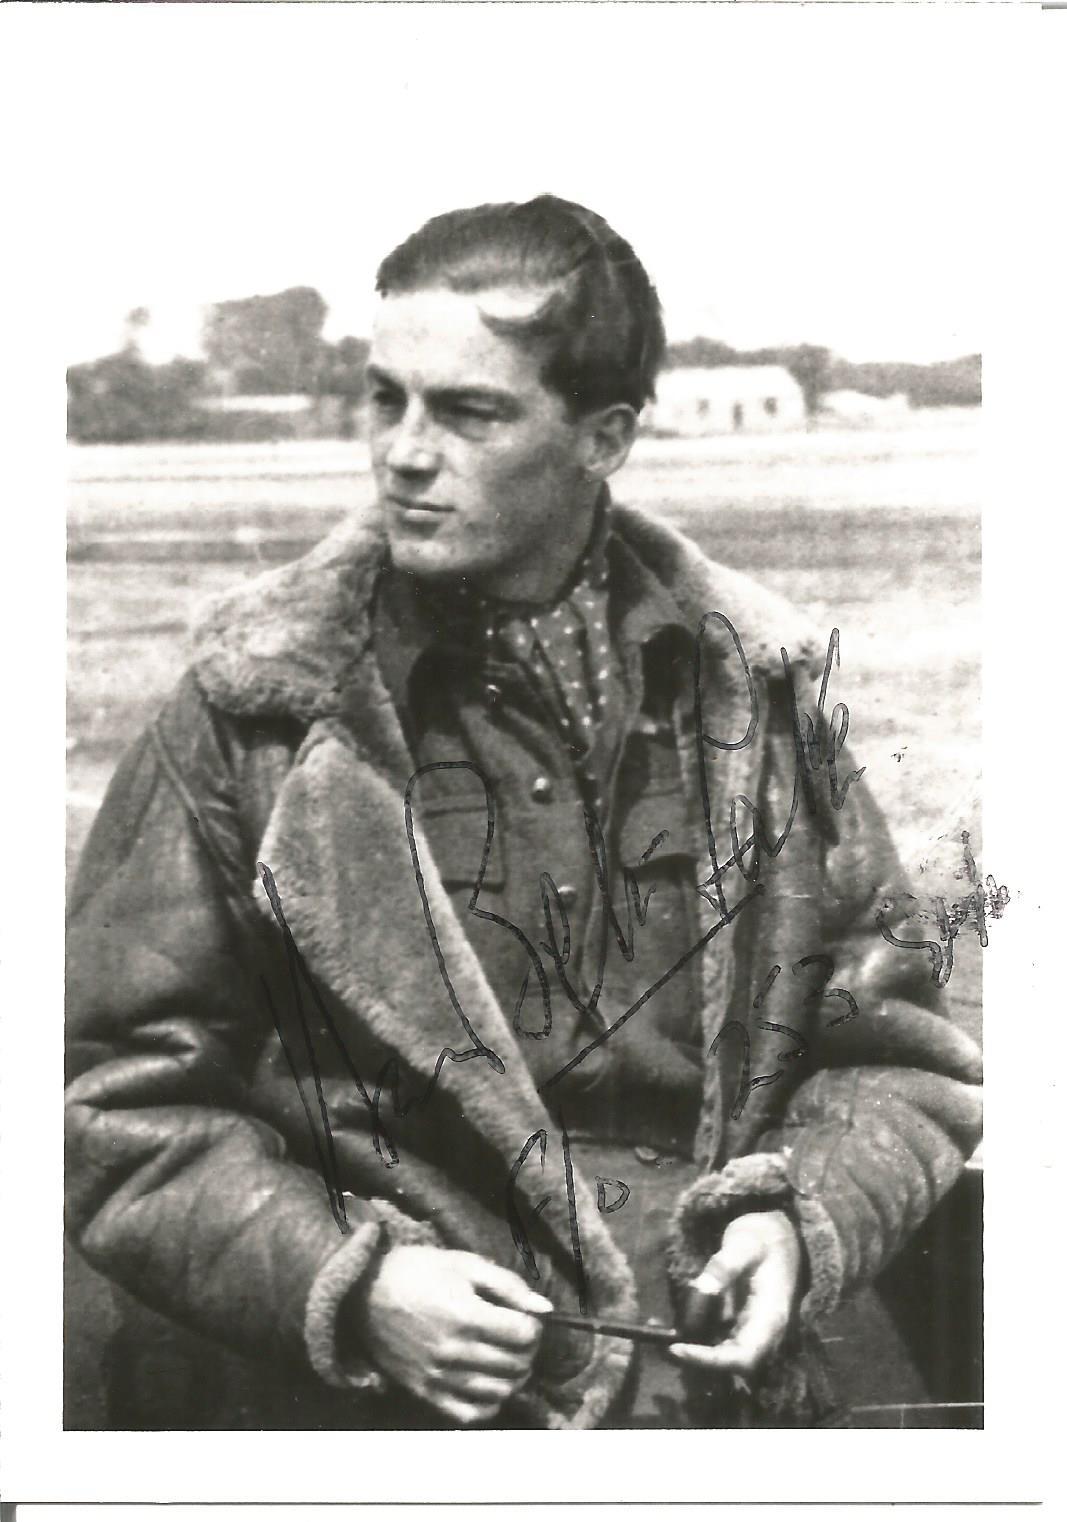 WW2 BOB fighter ace Flight Lieutenant D. Bell Salter of 253 Squadron signed 5 x 3 b w photo. Good